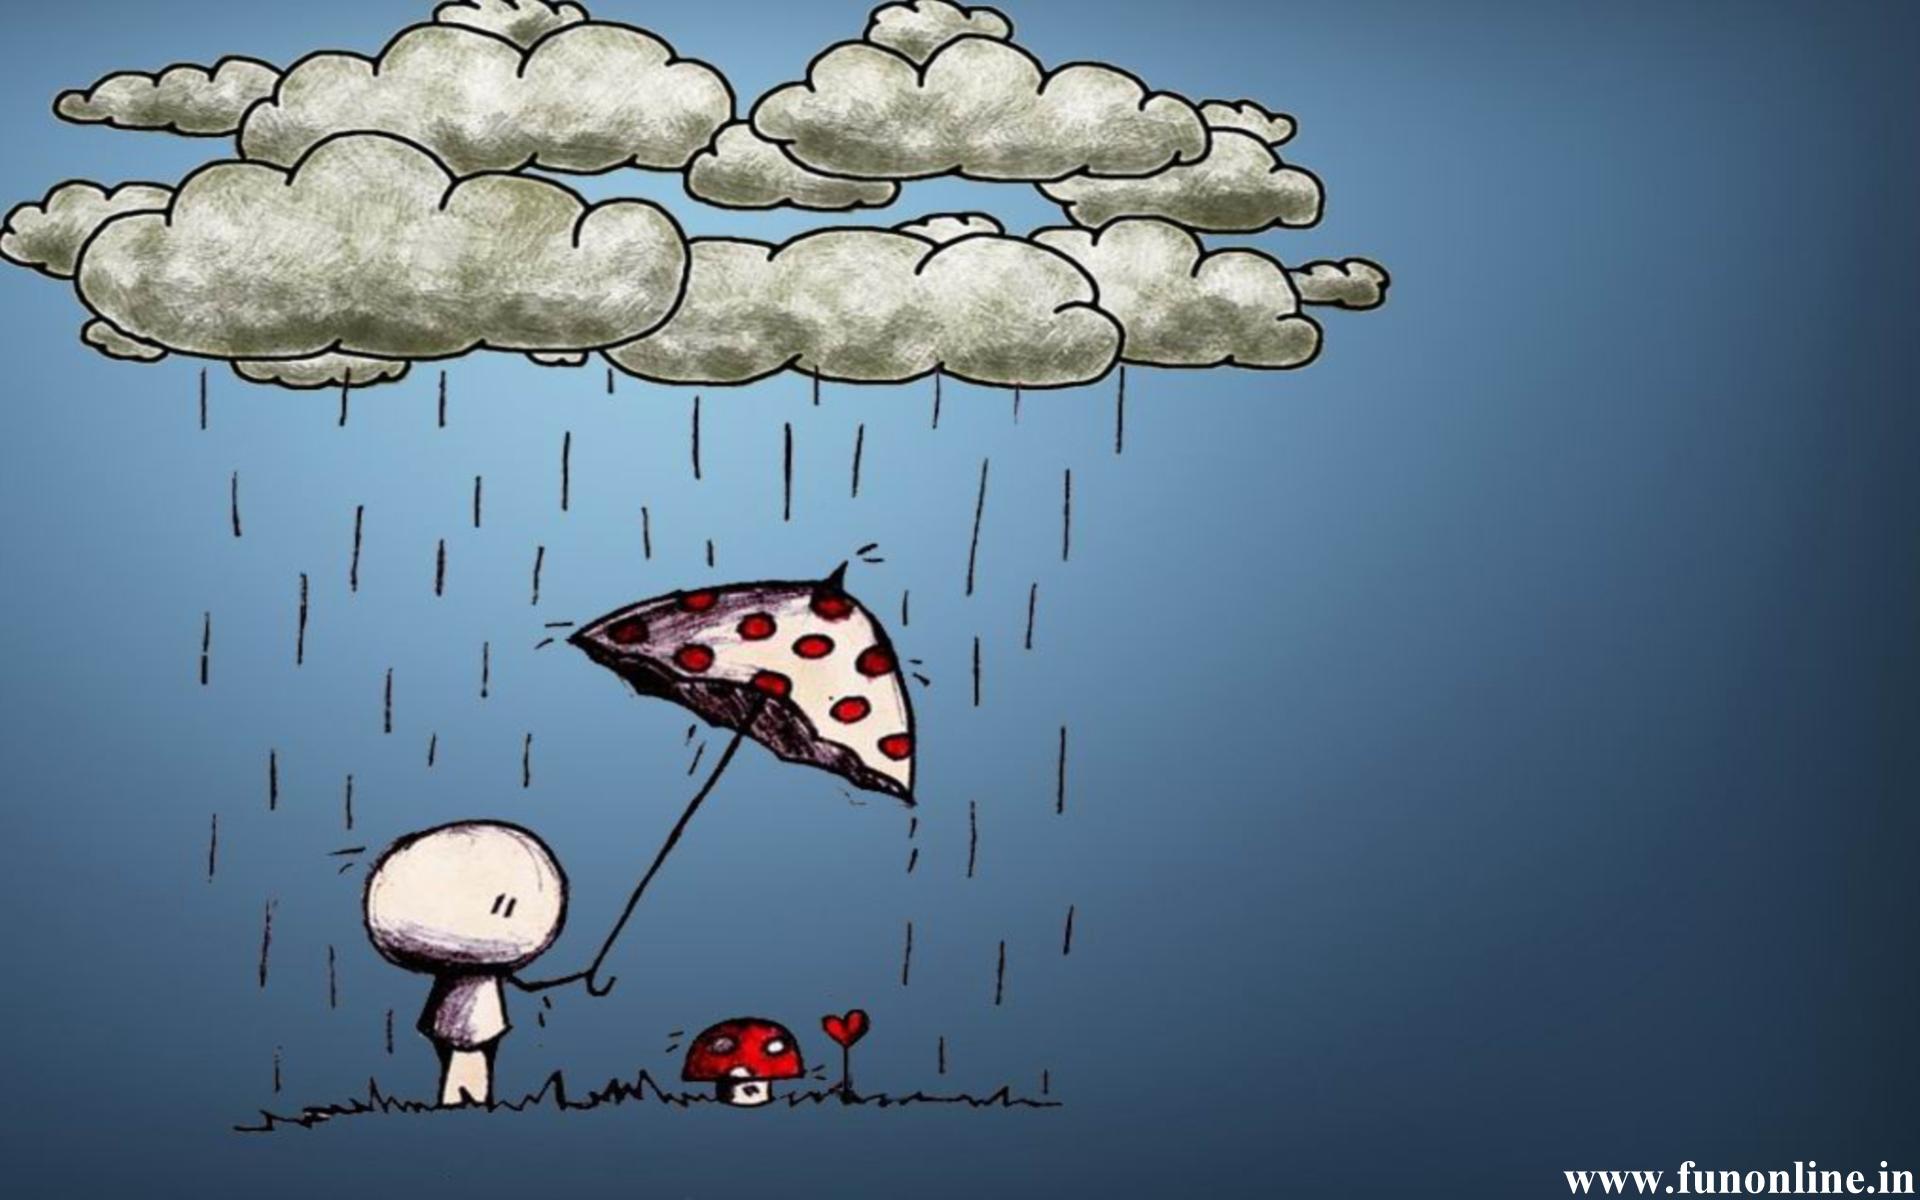 Fantastic Wallpaper Love Rain - funny-cartoons-about-love-13-wide-wallpaper  Image_38541.jpg